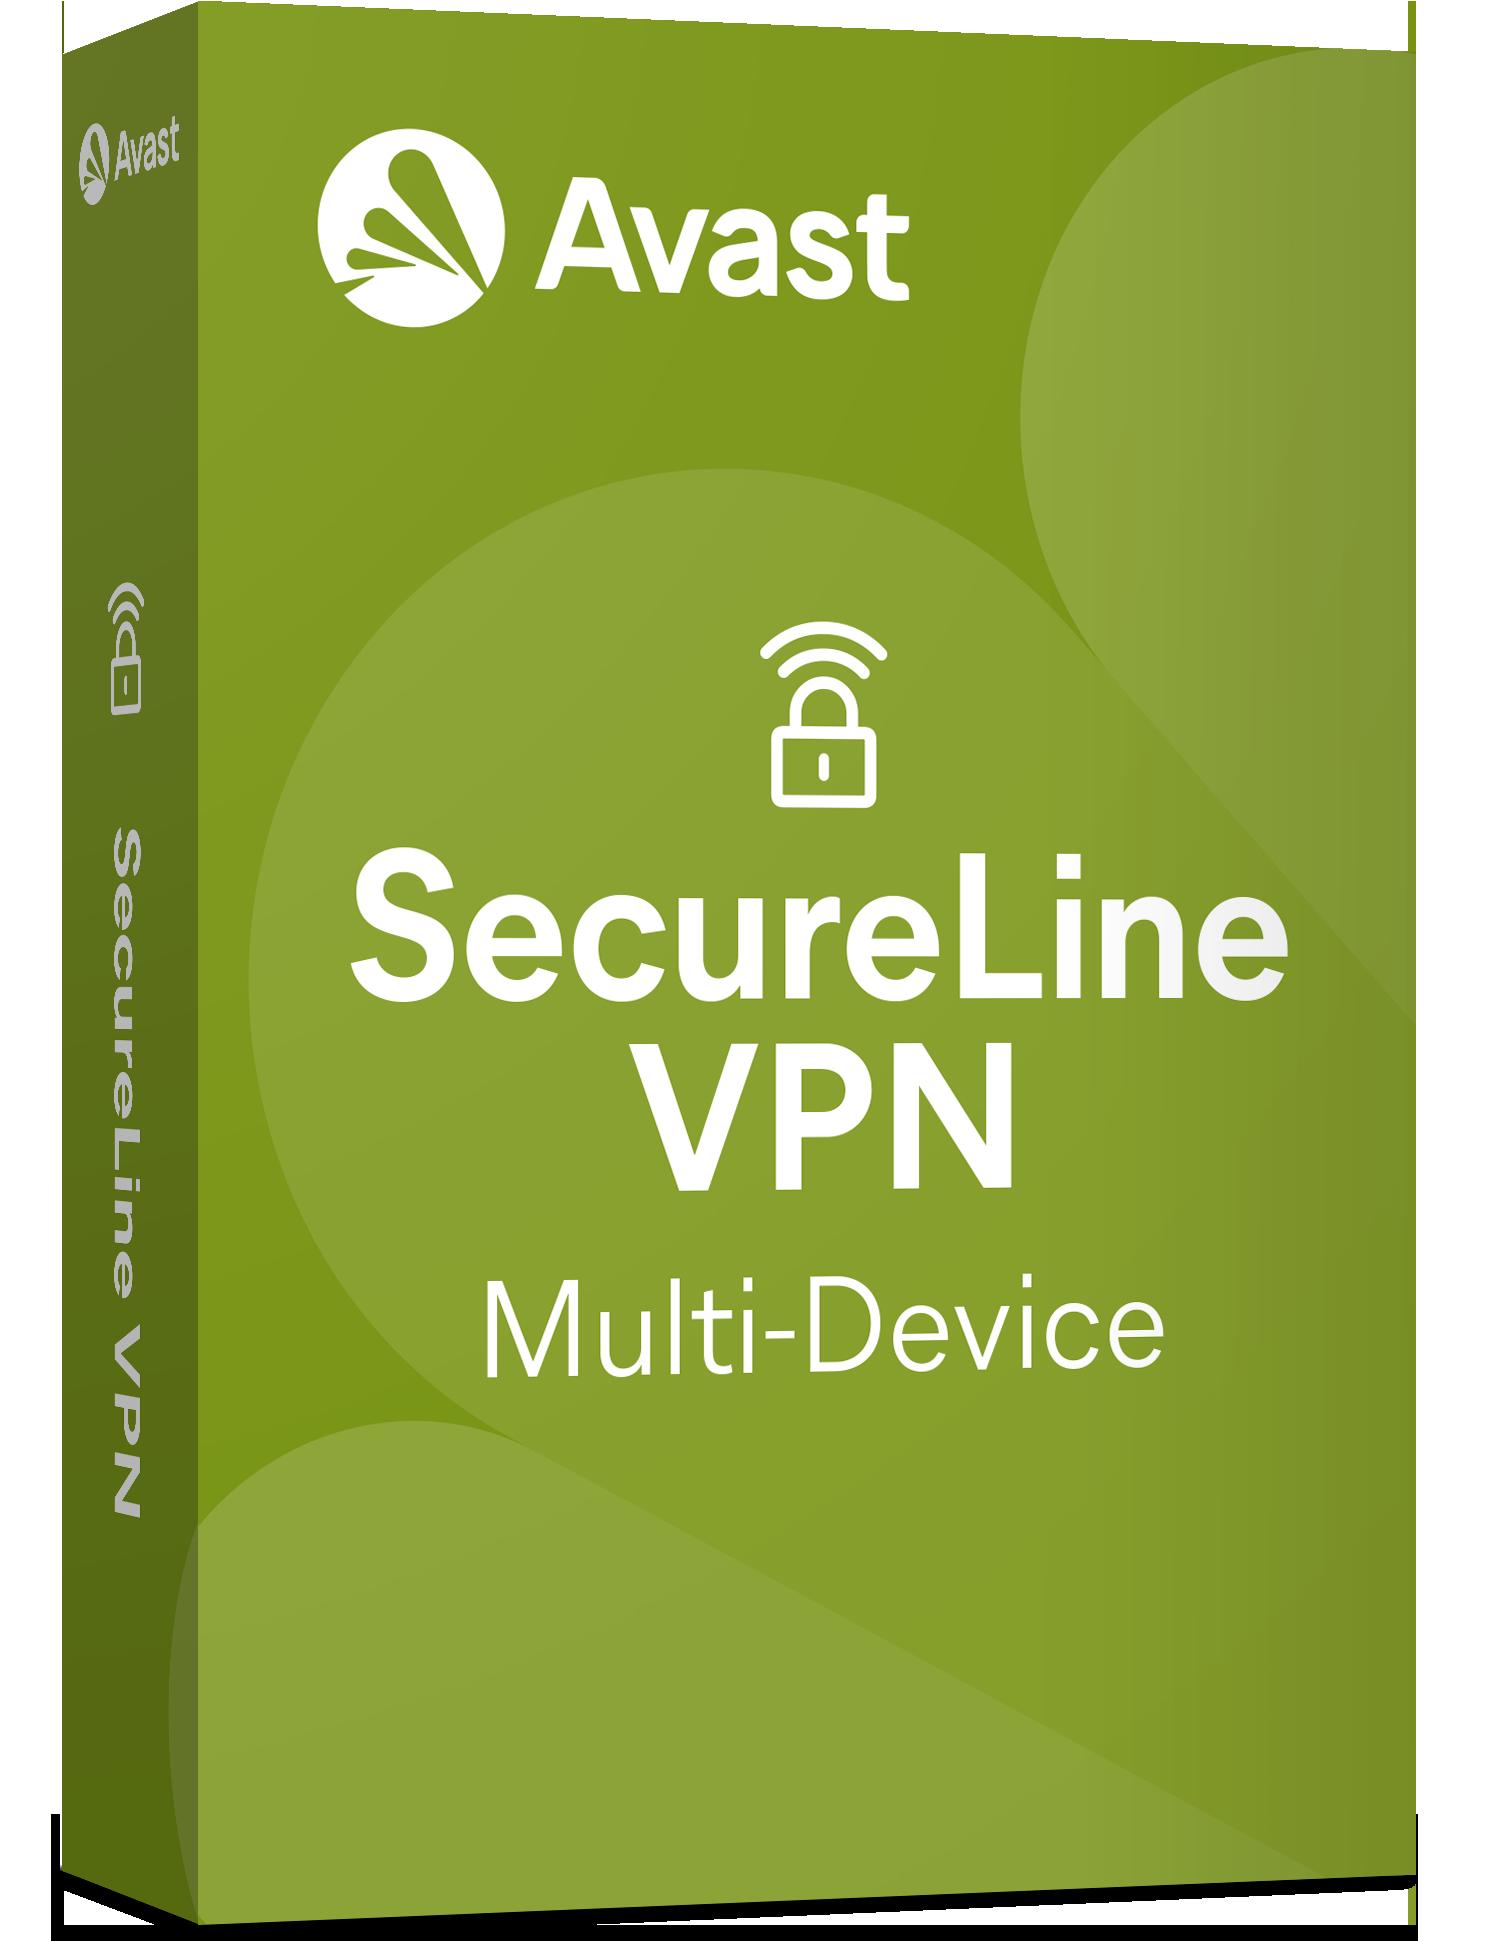 Avast SecureLine VPN Multi-Device